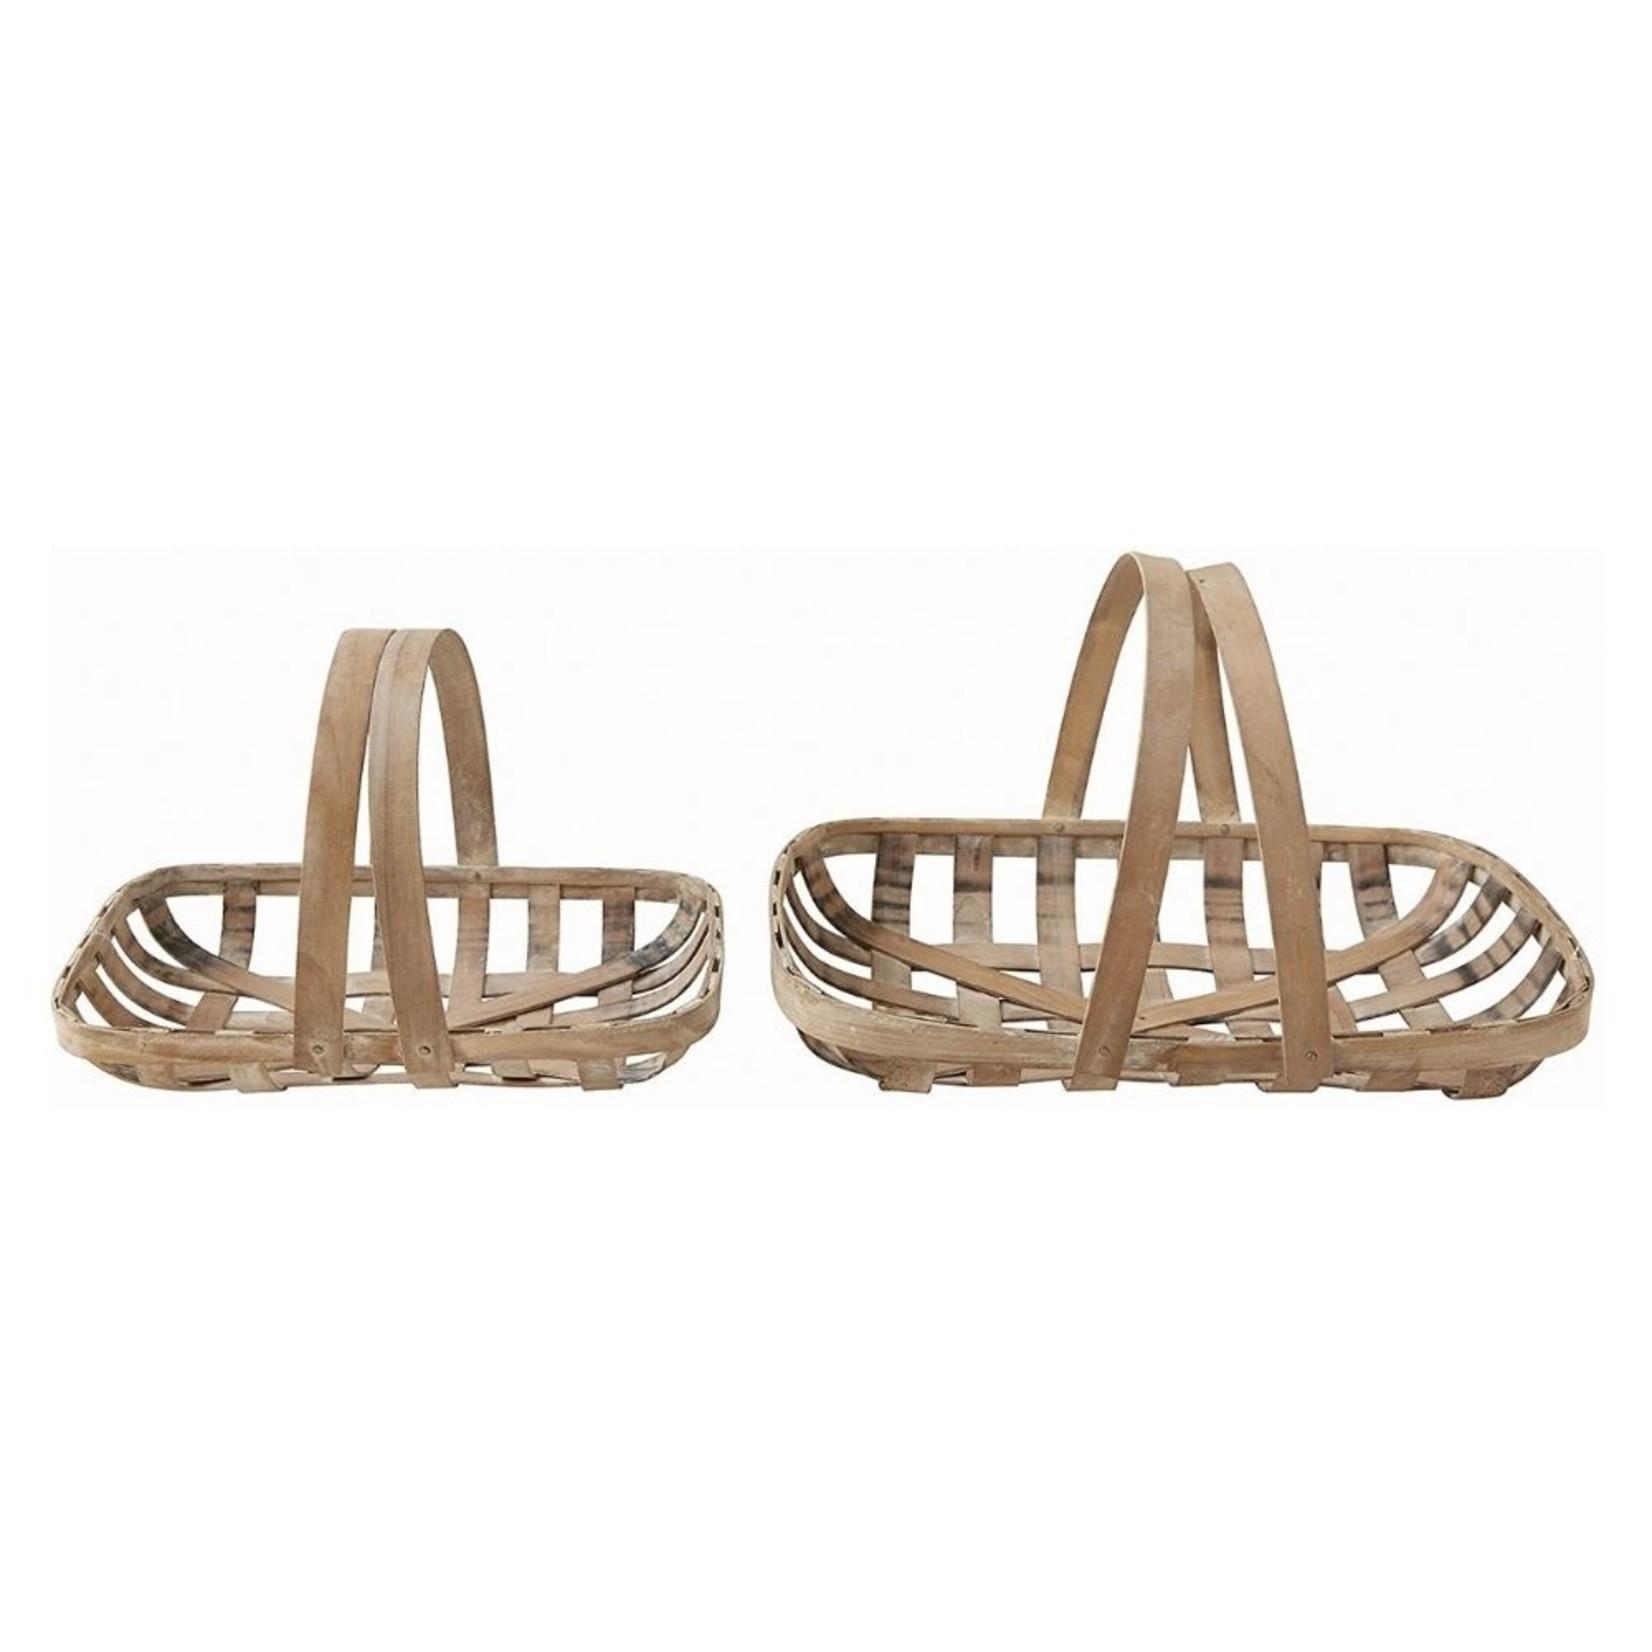 Wooden Flower Baskets